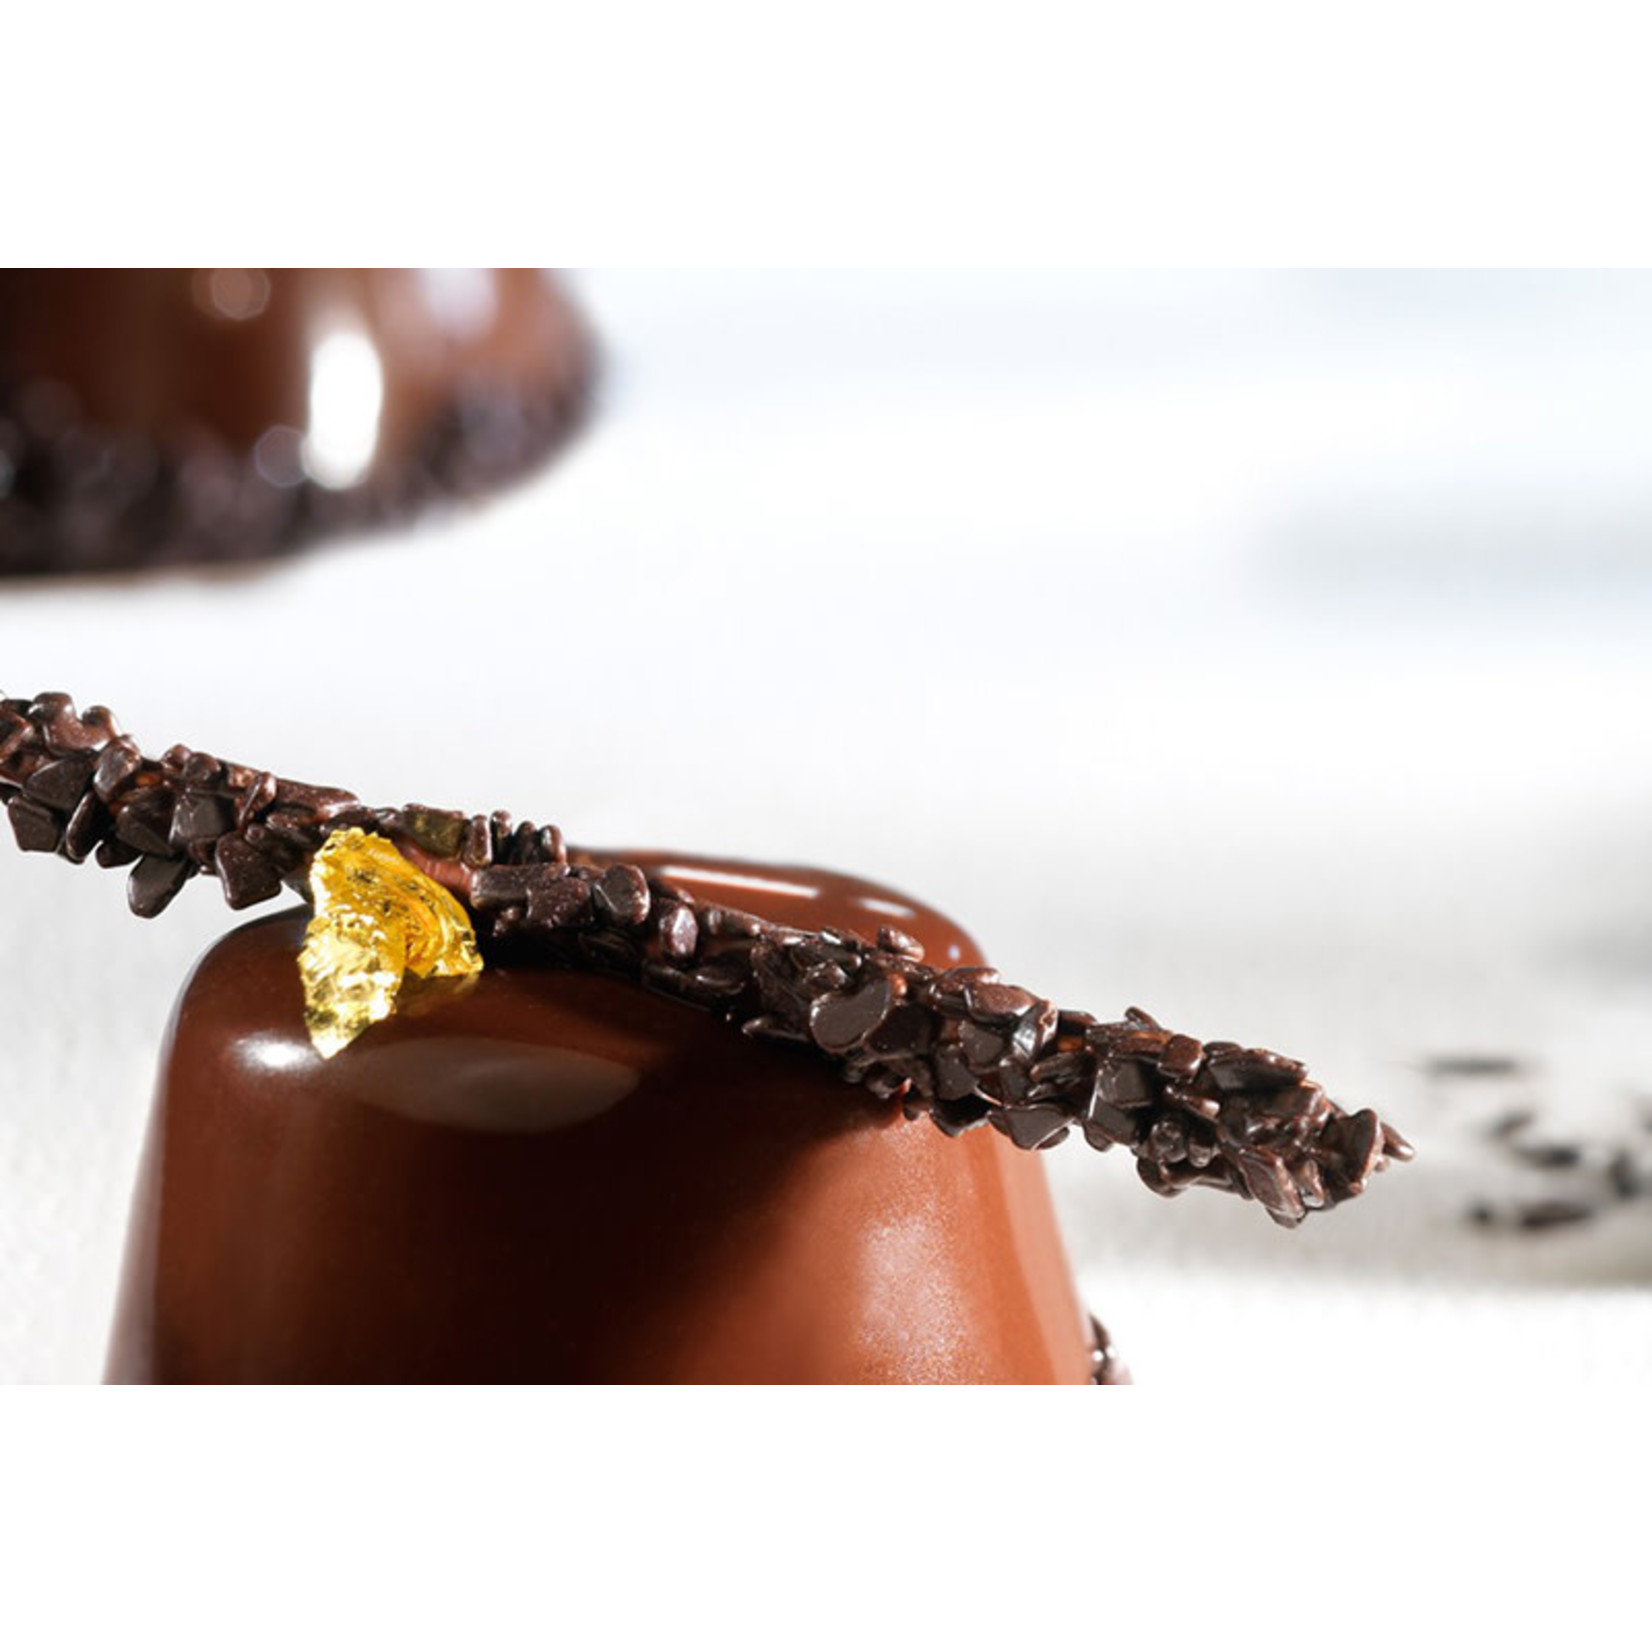 Barry Callebaut Barry Callebaut - Dark Chocolate Flakes, Small - 1 kg/2.2lb, SPLIT-4-D-E2-U68